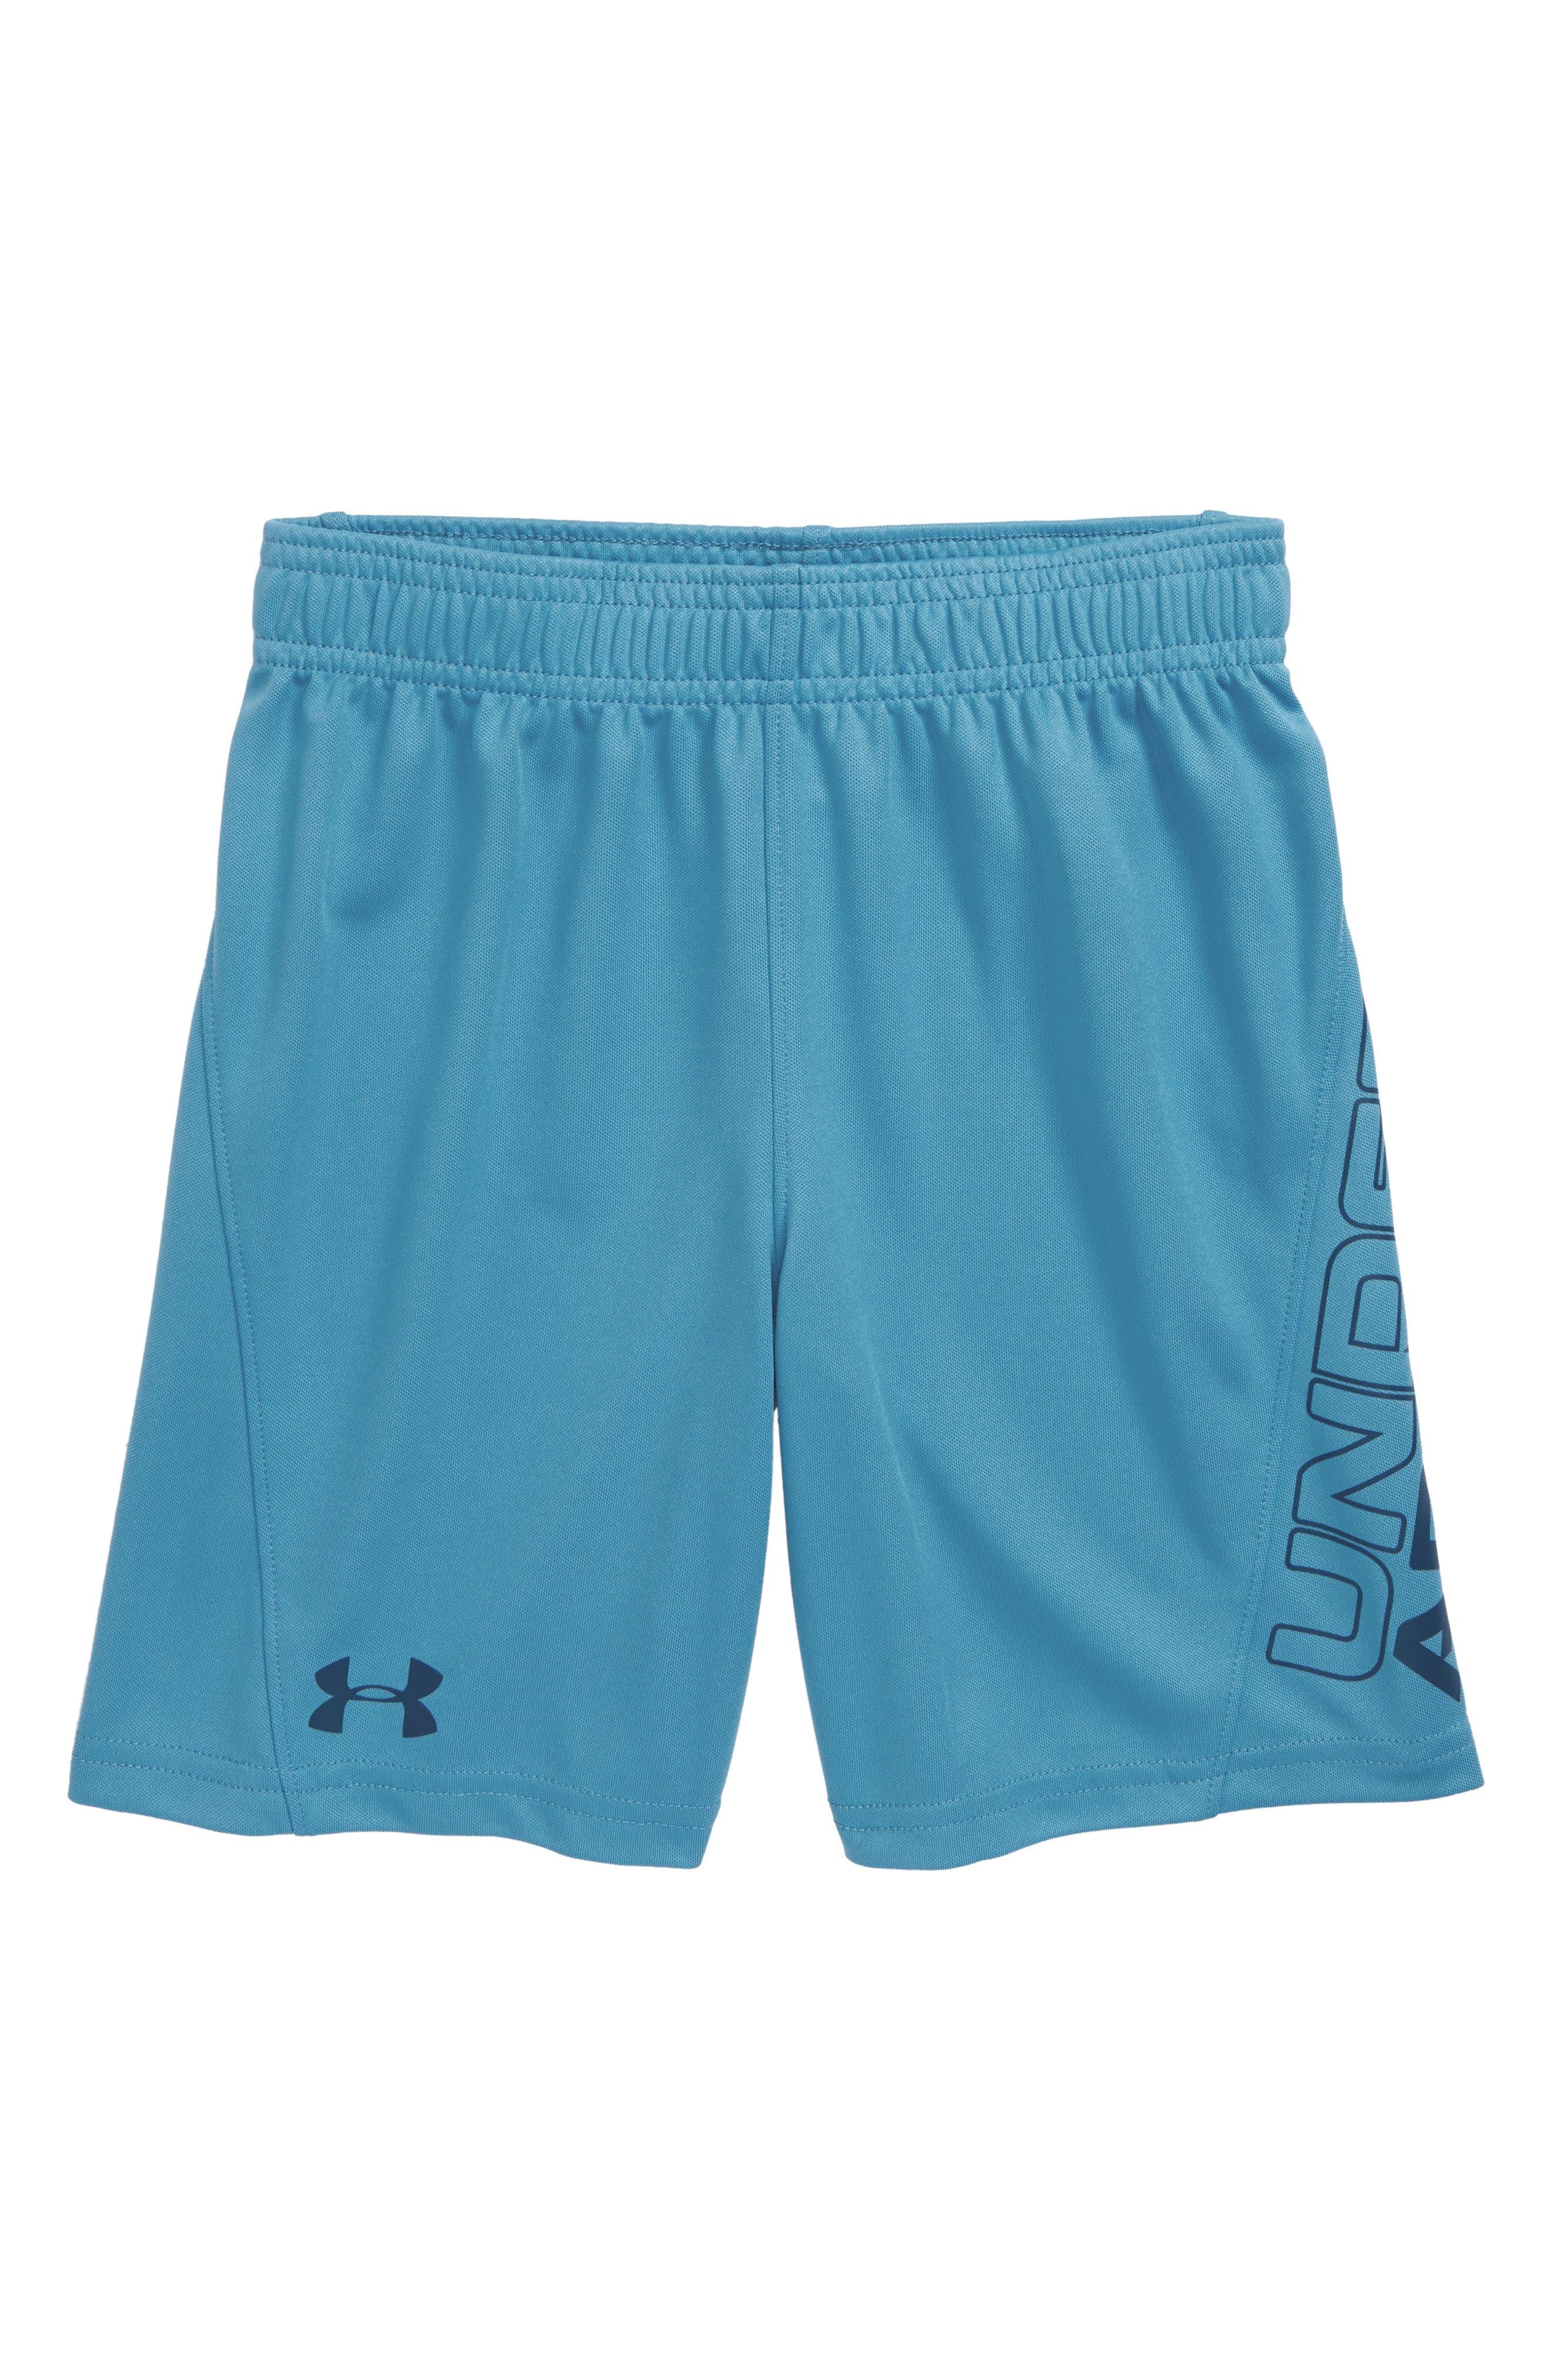 Boys Under Armour Kick Off Heatgear Athletic Shorts Size 6  Blue